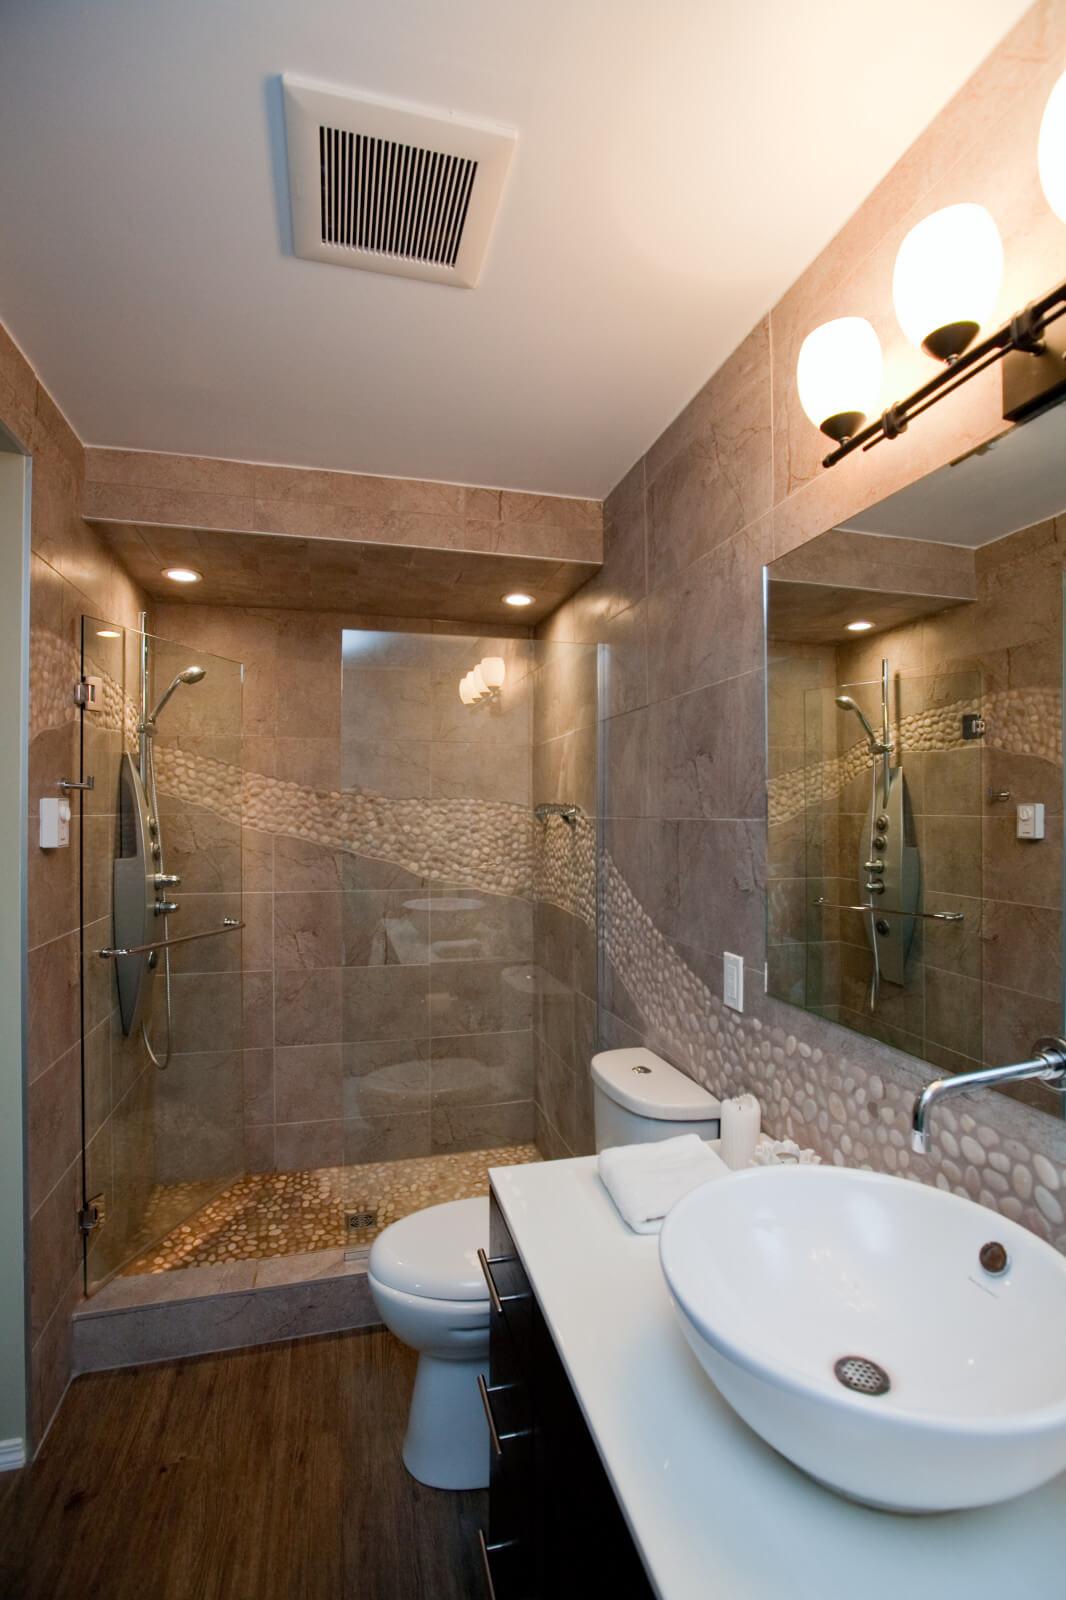 Hamilton Meadows Bathroom Renovation - All Canadian Renovations Ltd. - Bathroom Renovations Winnipeg, Manitoba